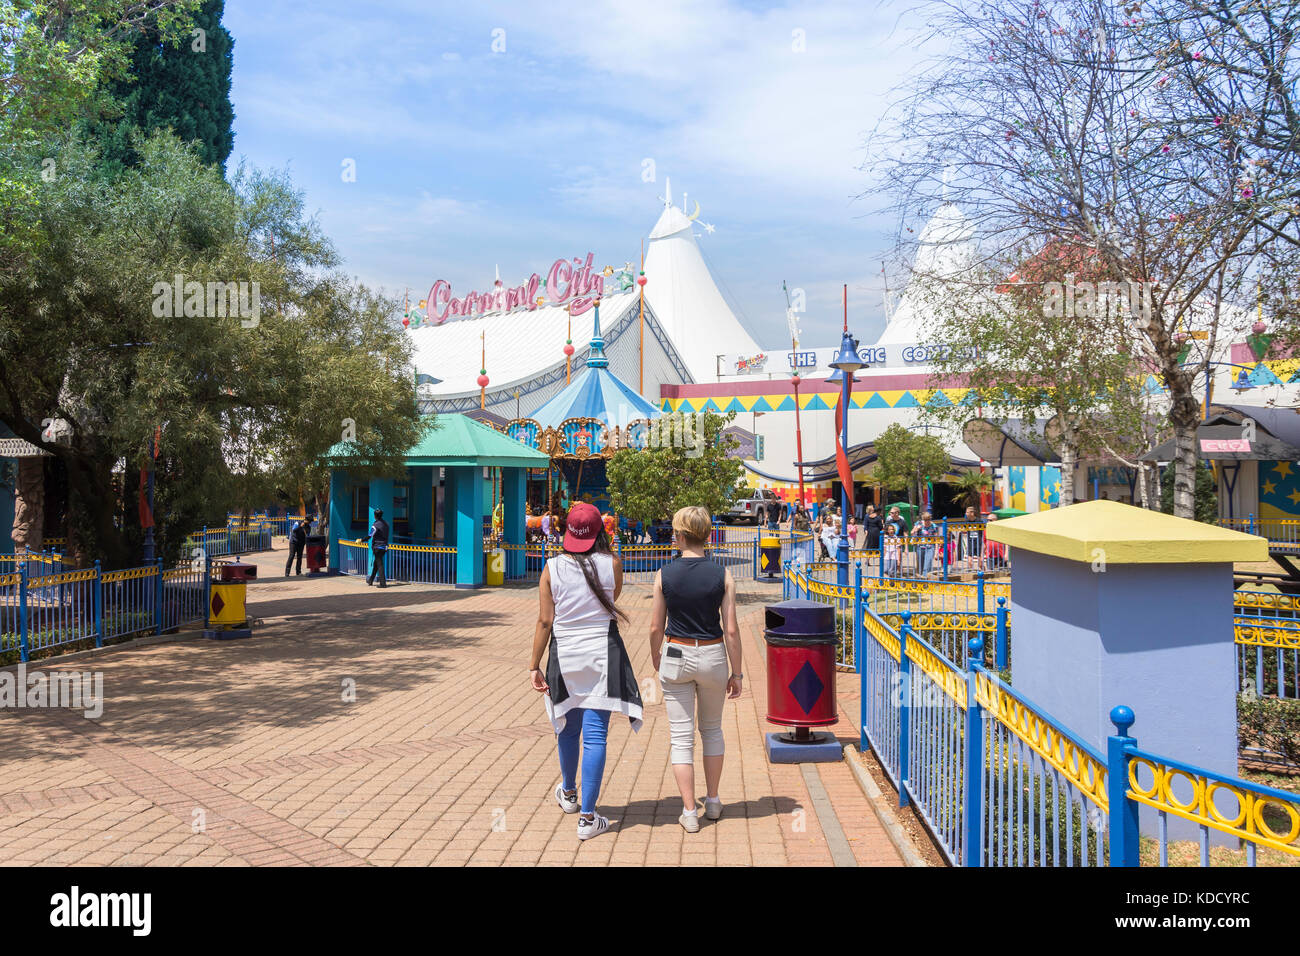 Fairground at Carnival City Casino & Entertainment World, Brakpan, East Rand, Greater Johannesberg, Gauteng, - Stock Image